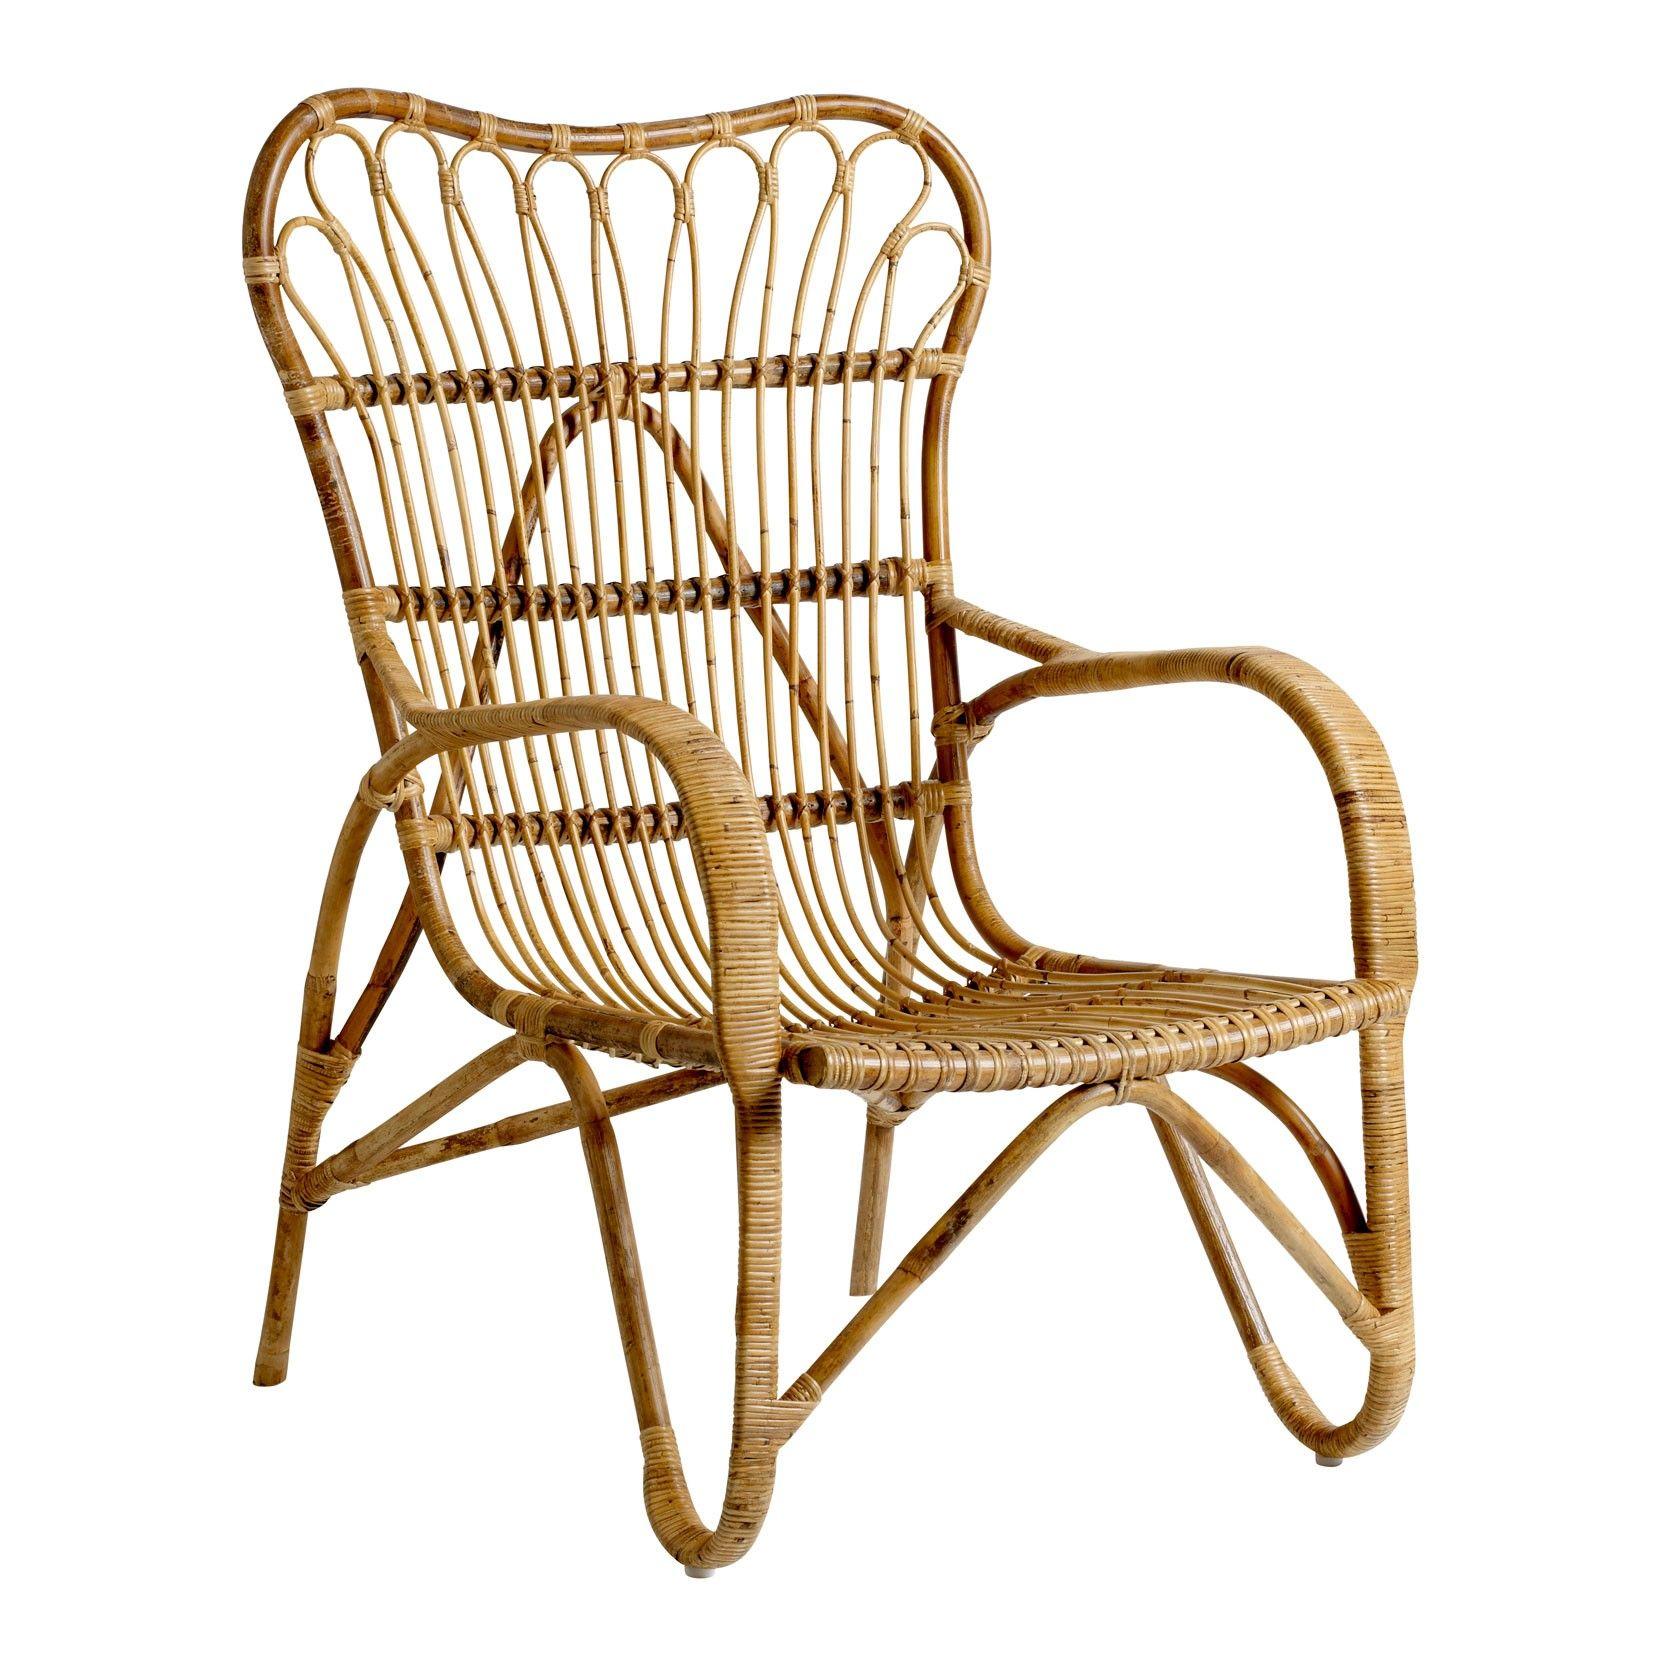 Bloomingville Rotan Stoel Mom Rattan Armchair Rattan Lounge Chair Rattan Chair